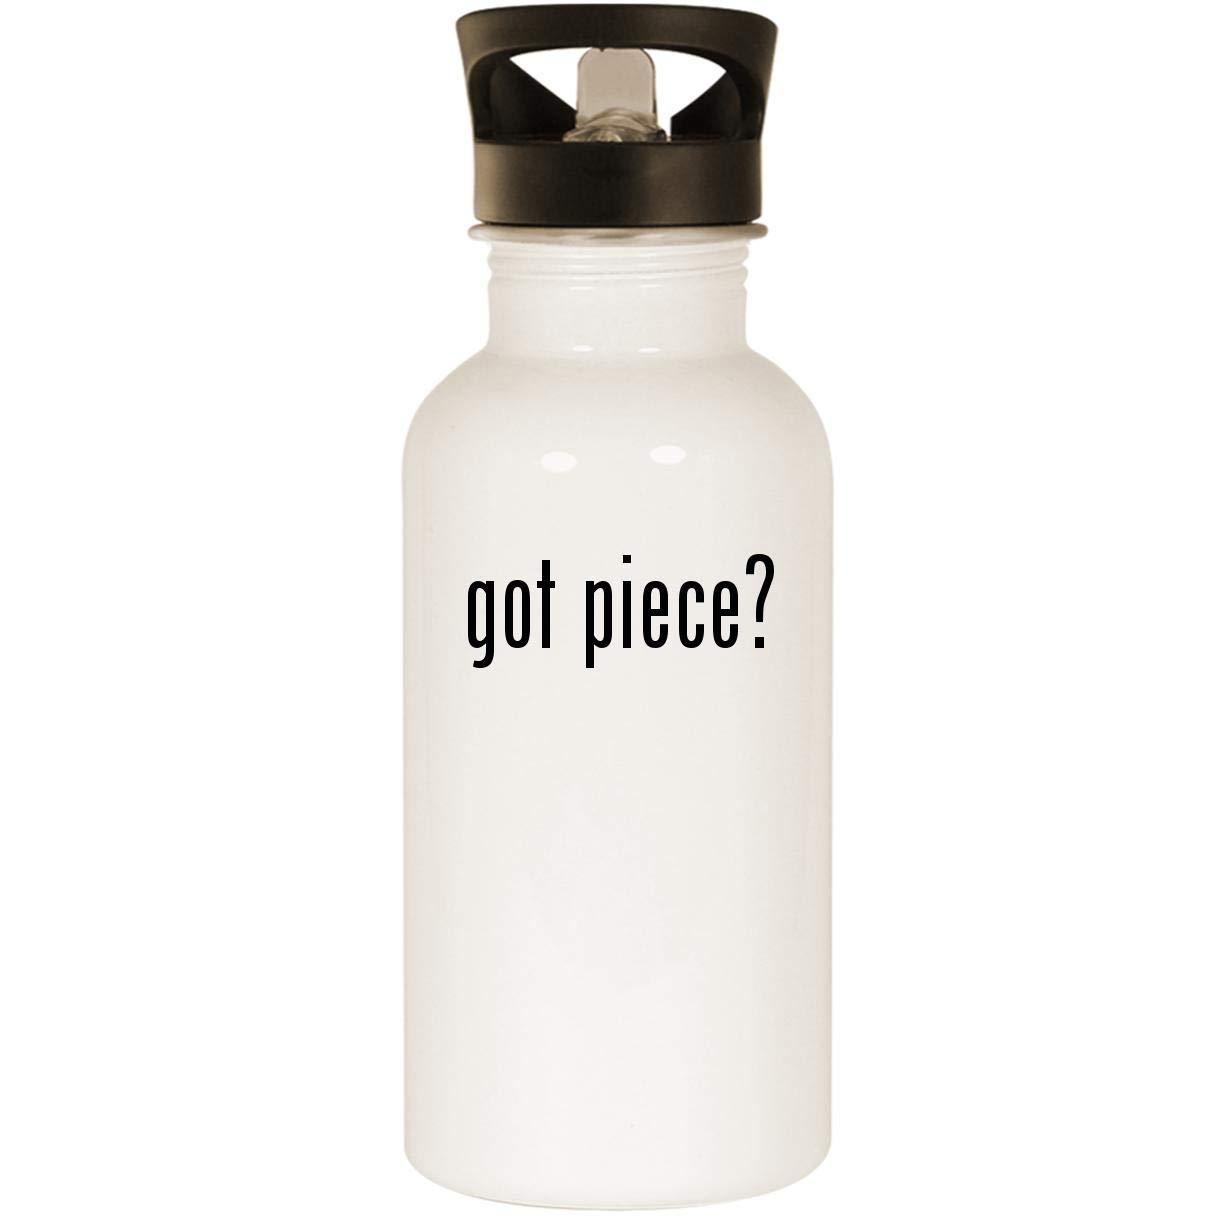 got piece? - Stainless Steel 20oz Road Ready Water Bottle, White